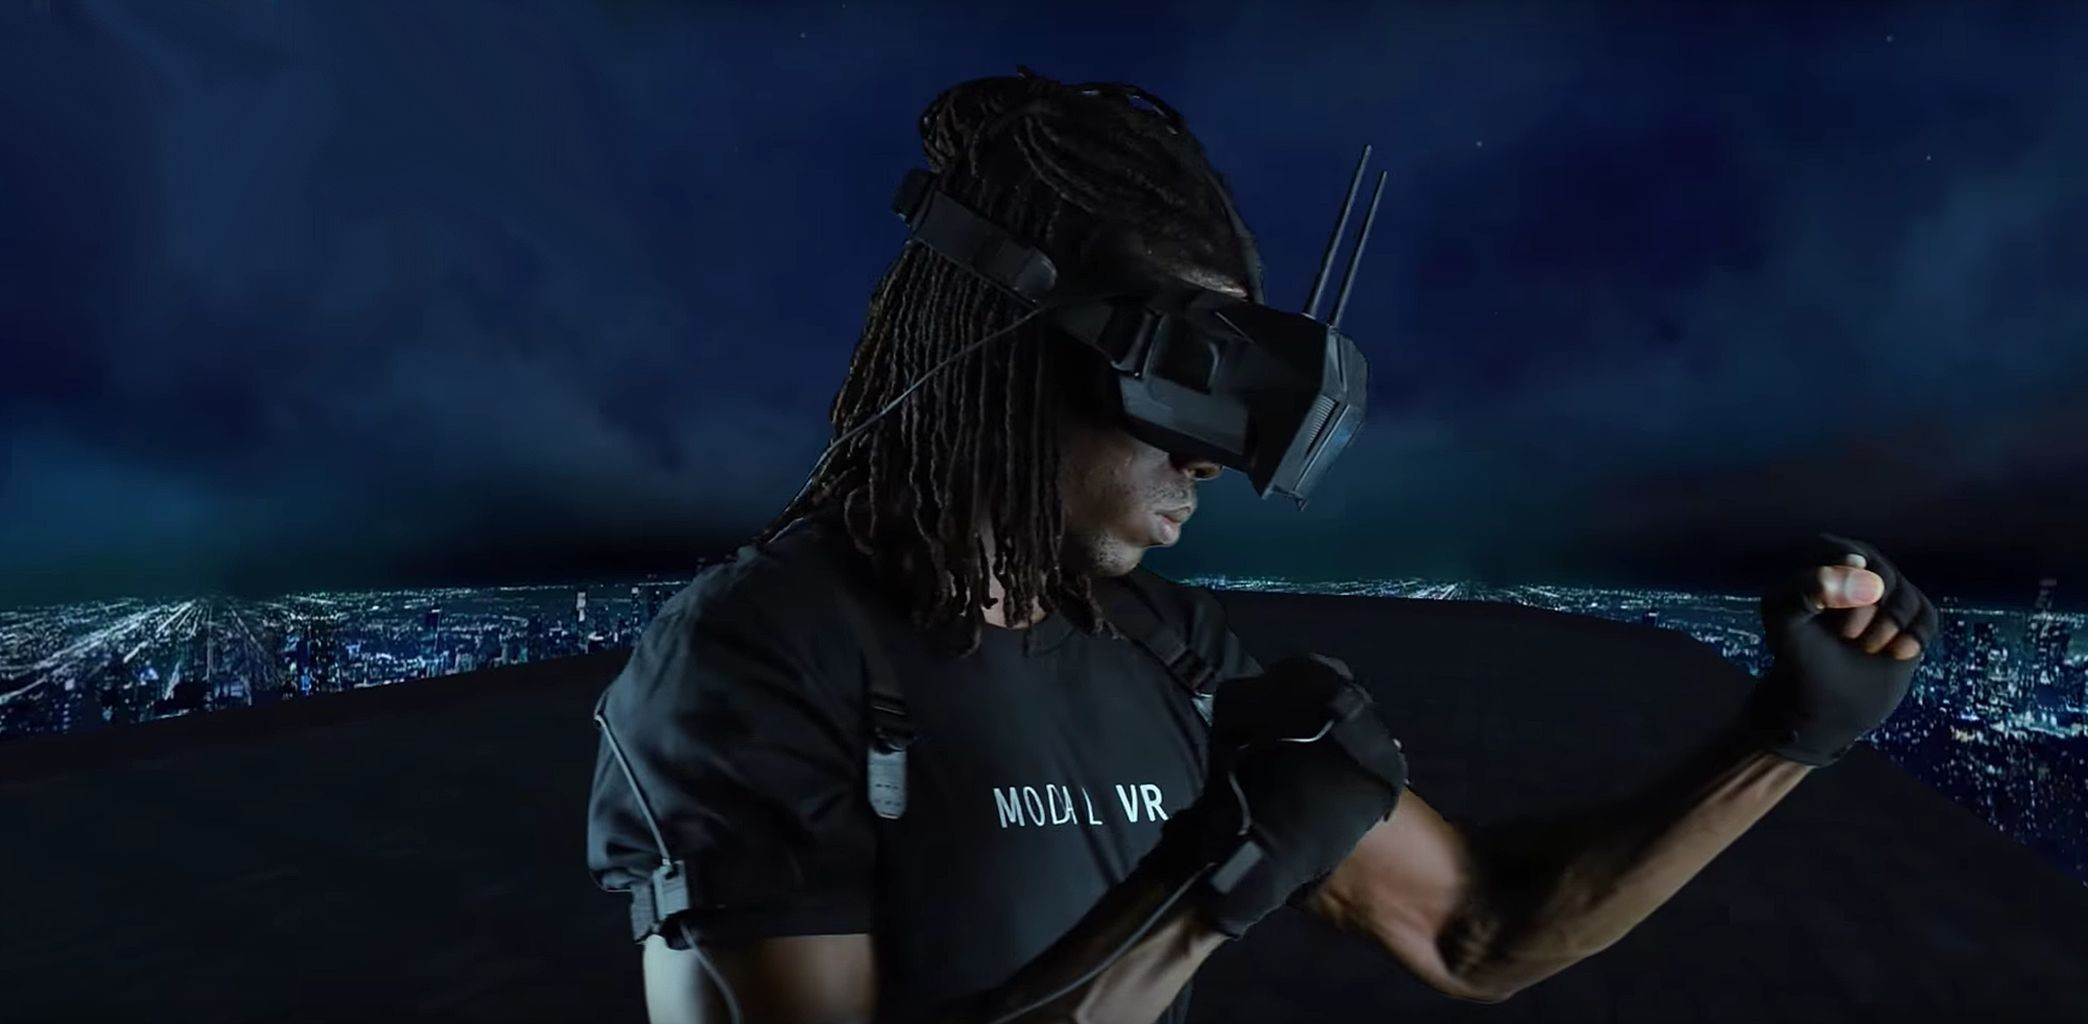 Wallpaper Modal Vr Vr Atari Virtual Reality Vr Headset HD Wallpapers Download Free Images Wallpaper [1000image.com]